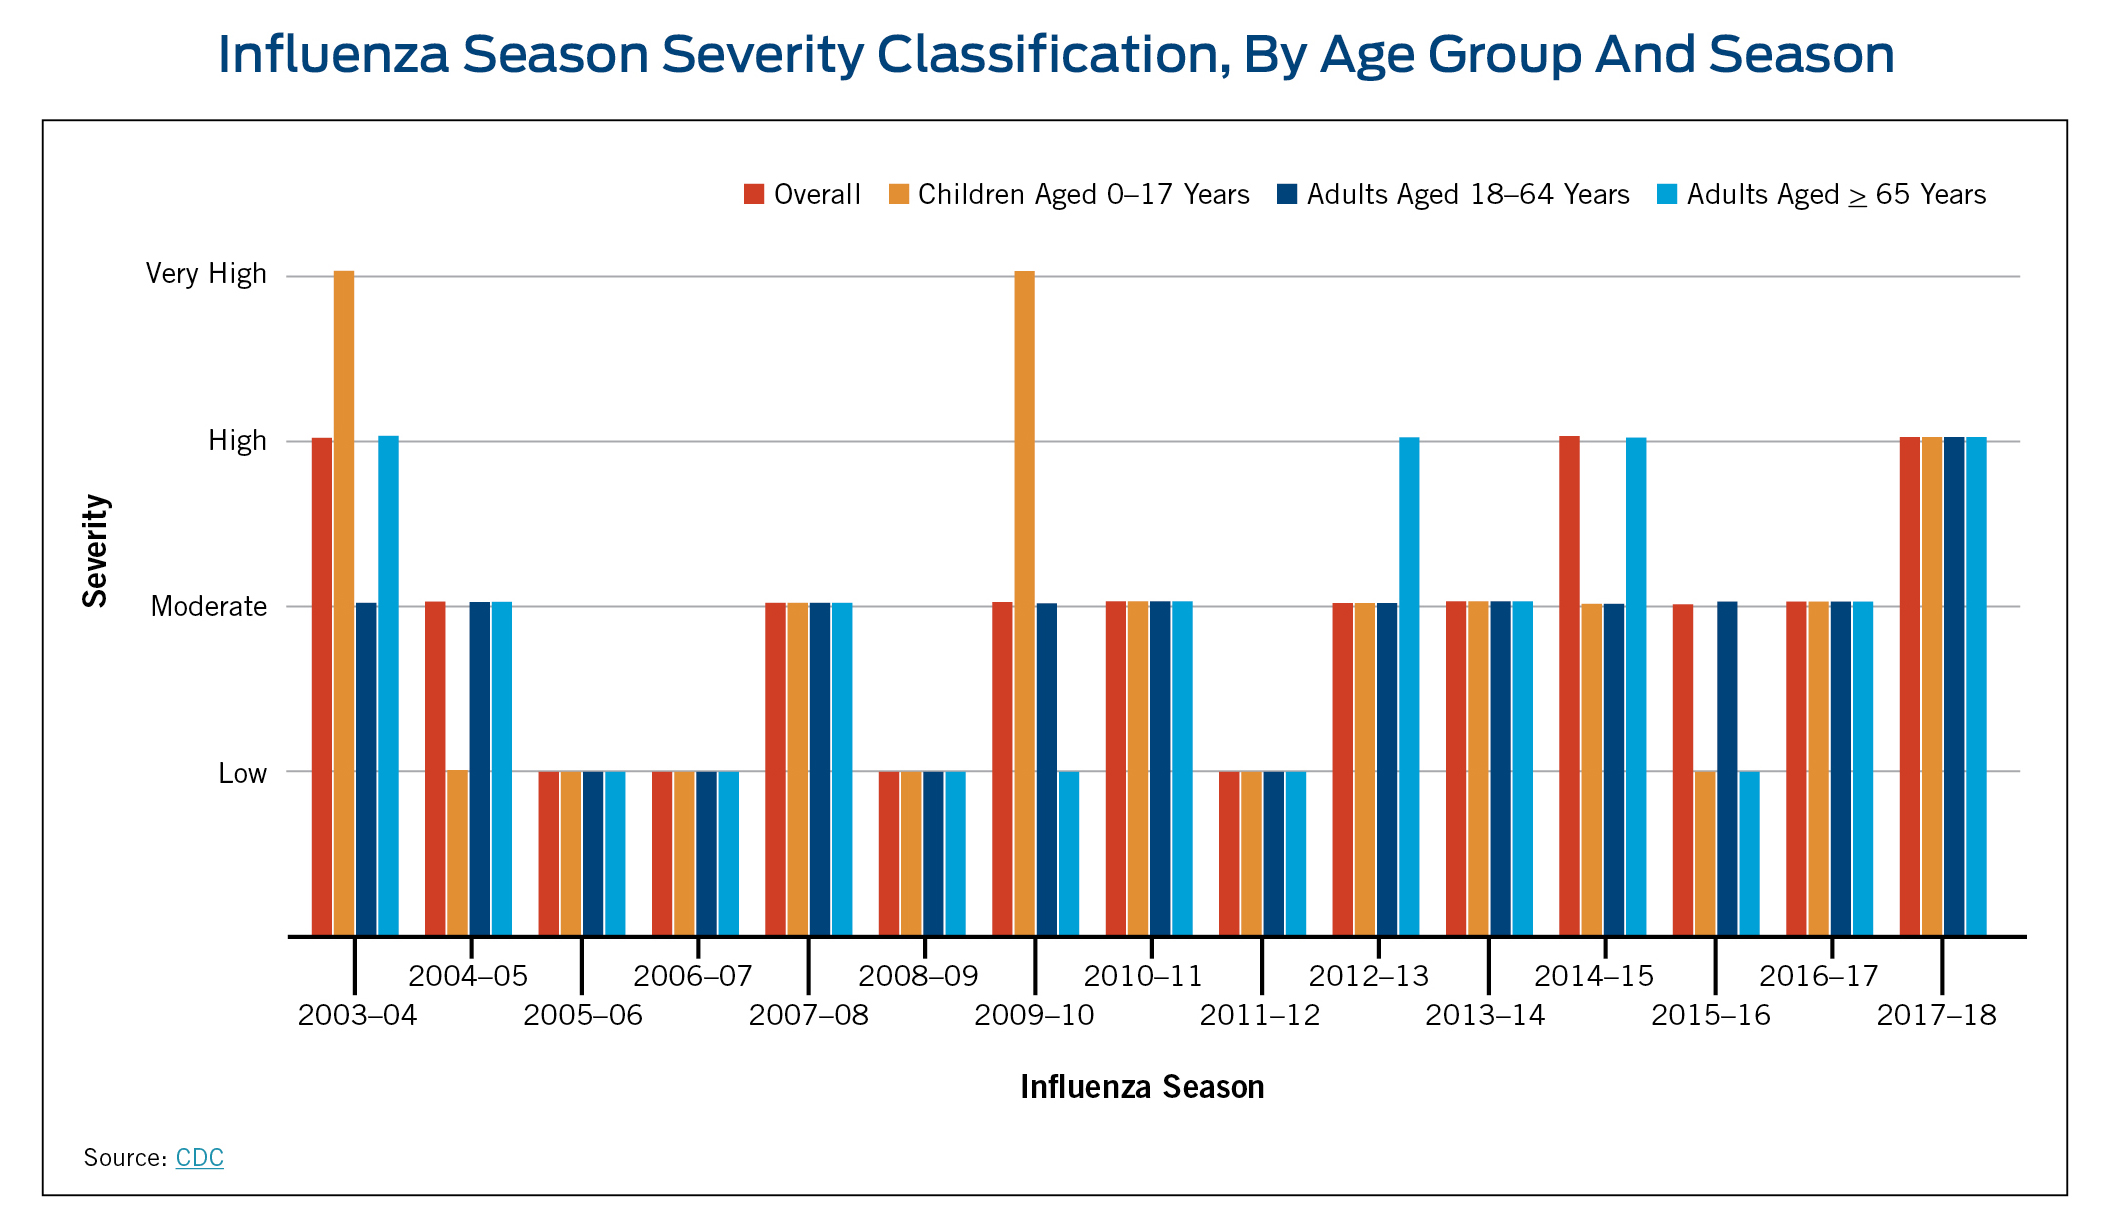 Insights For The 2018 19 Flu Season